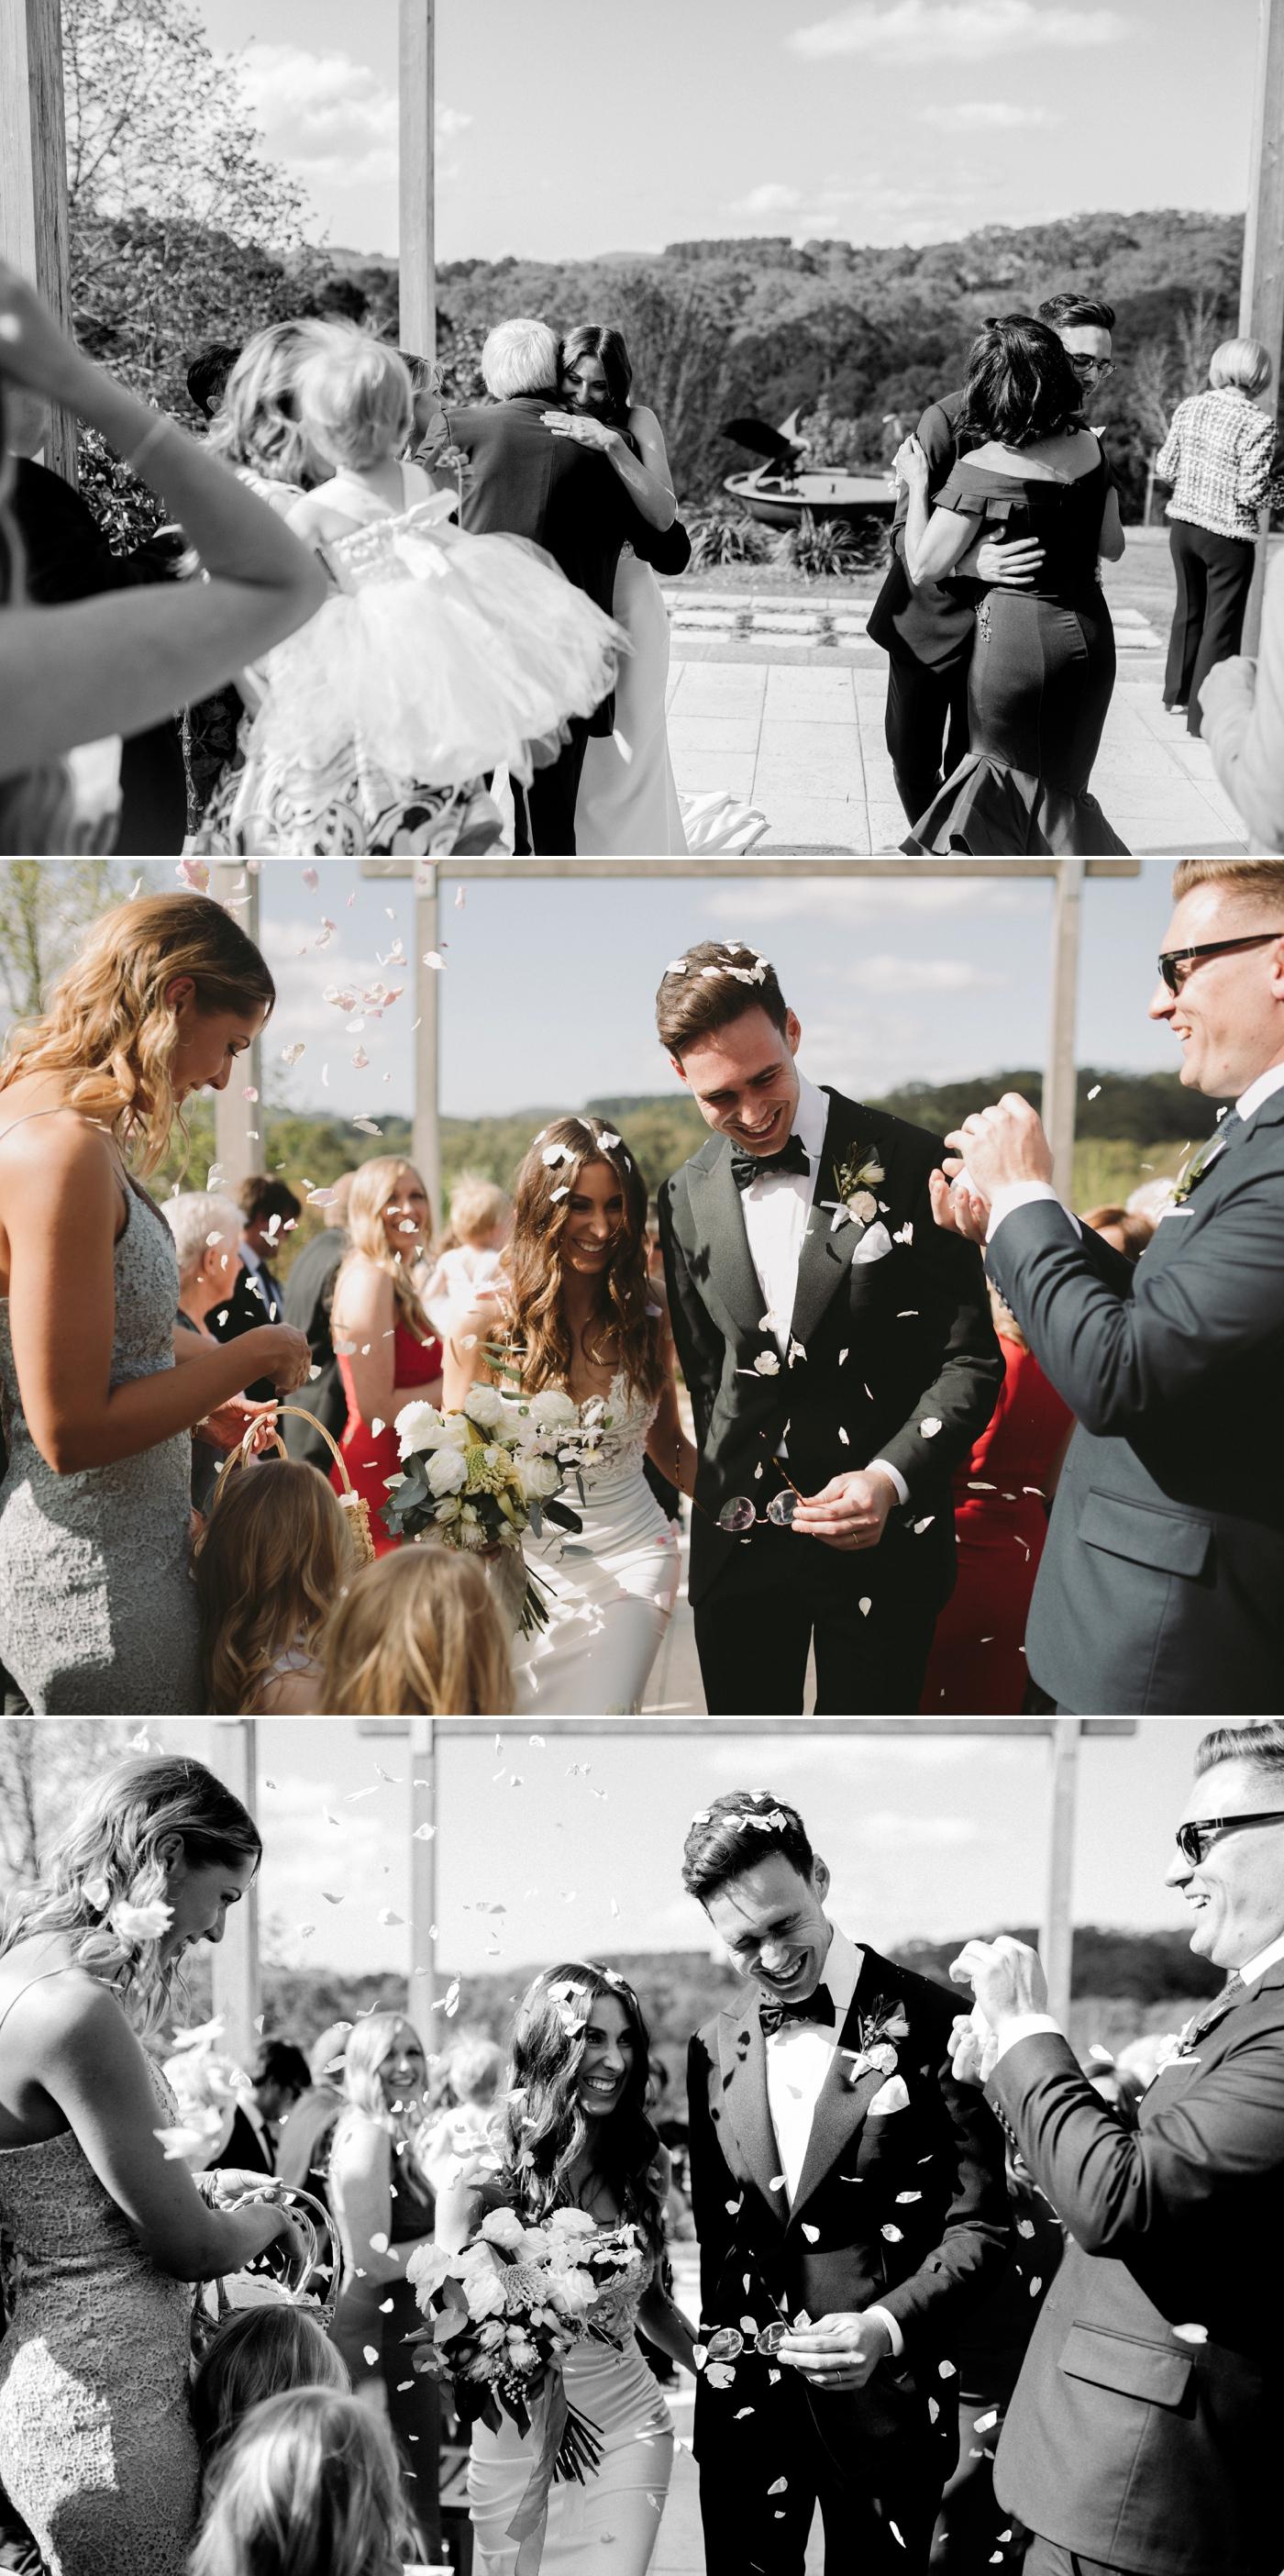 Katie and Ben - Natural Wedding Photography in Adelaide - Beautiful, Candid Wedding Photographer - Adelaide Hills Wedding - Katherine Schultz - www.katherineschultzphotography.com_0038.jpg